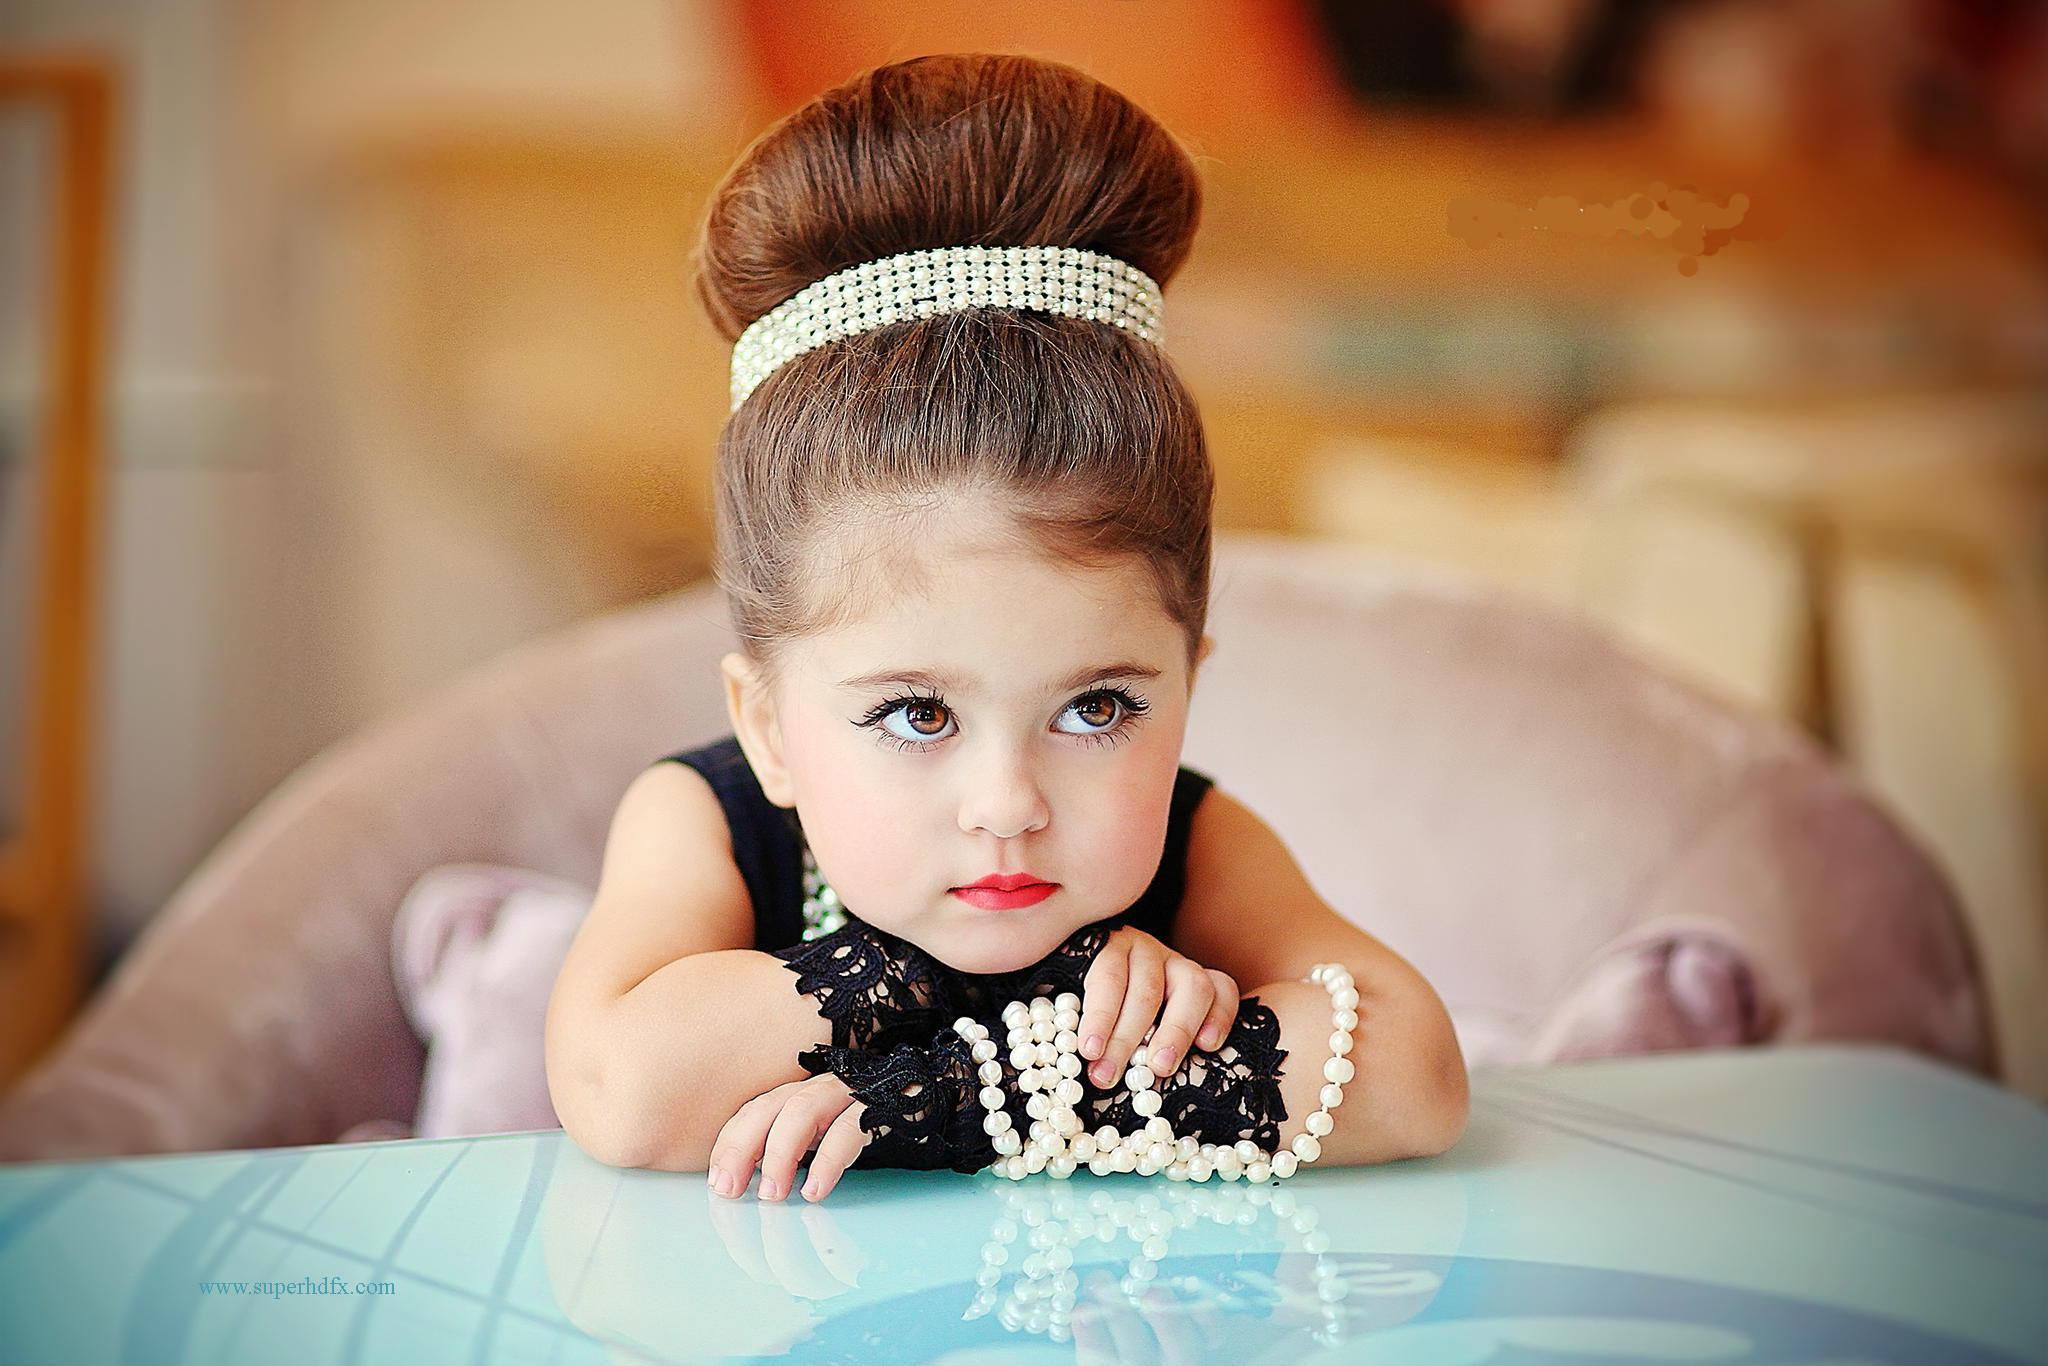 Beautiful Baby Hd Wallpapers Top Free Beautiful Baby Hd Backgrounds Wallpaperaccess